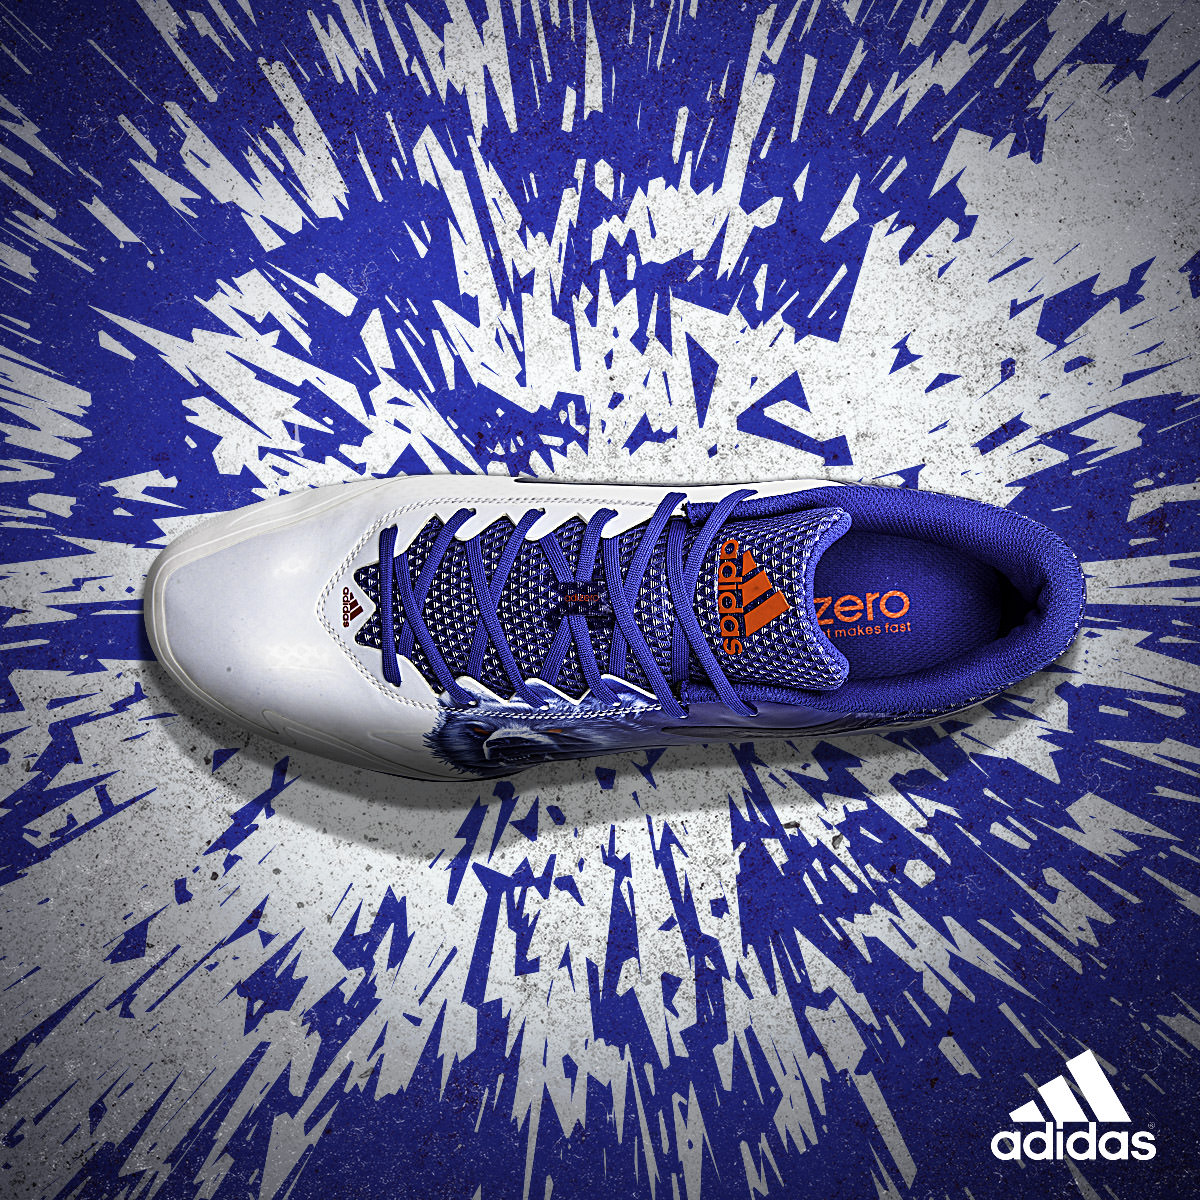 adidas_Baseball_Kris_Bryant_Uncaged_Bear_Top